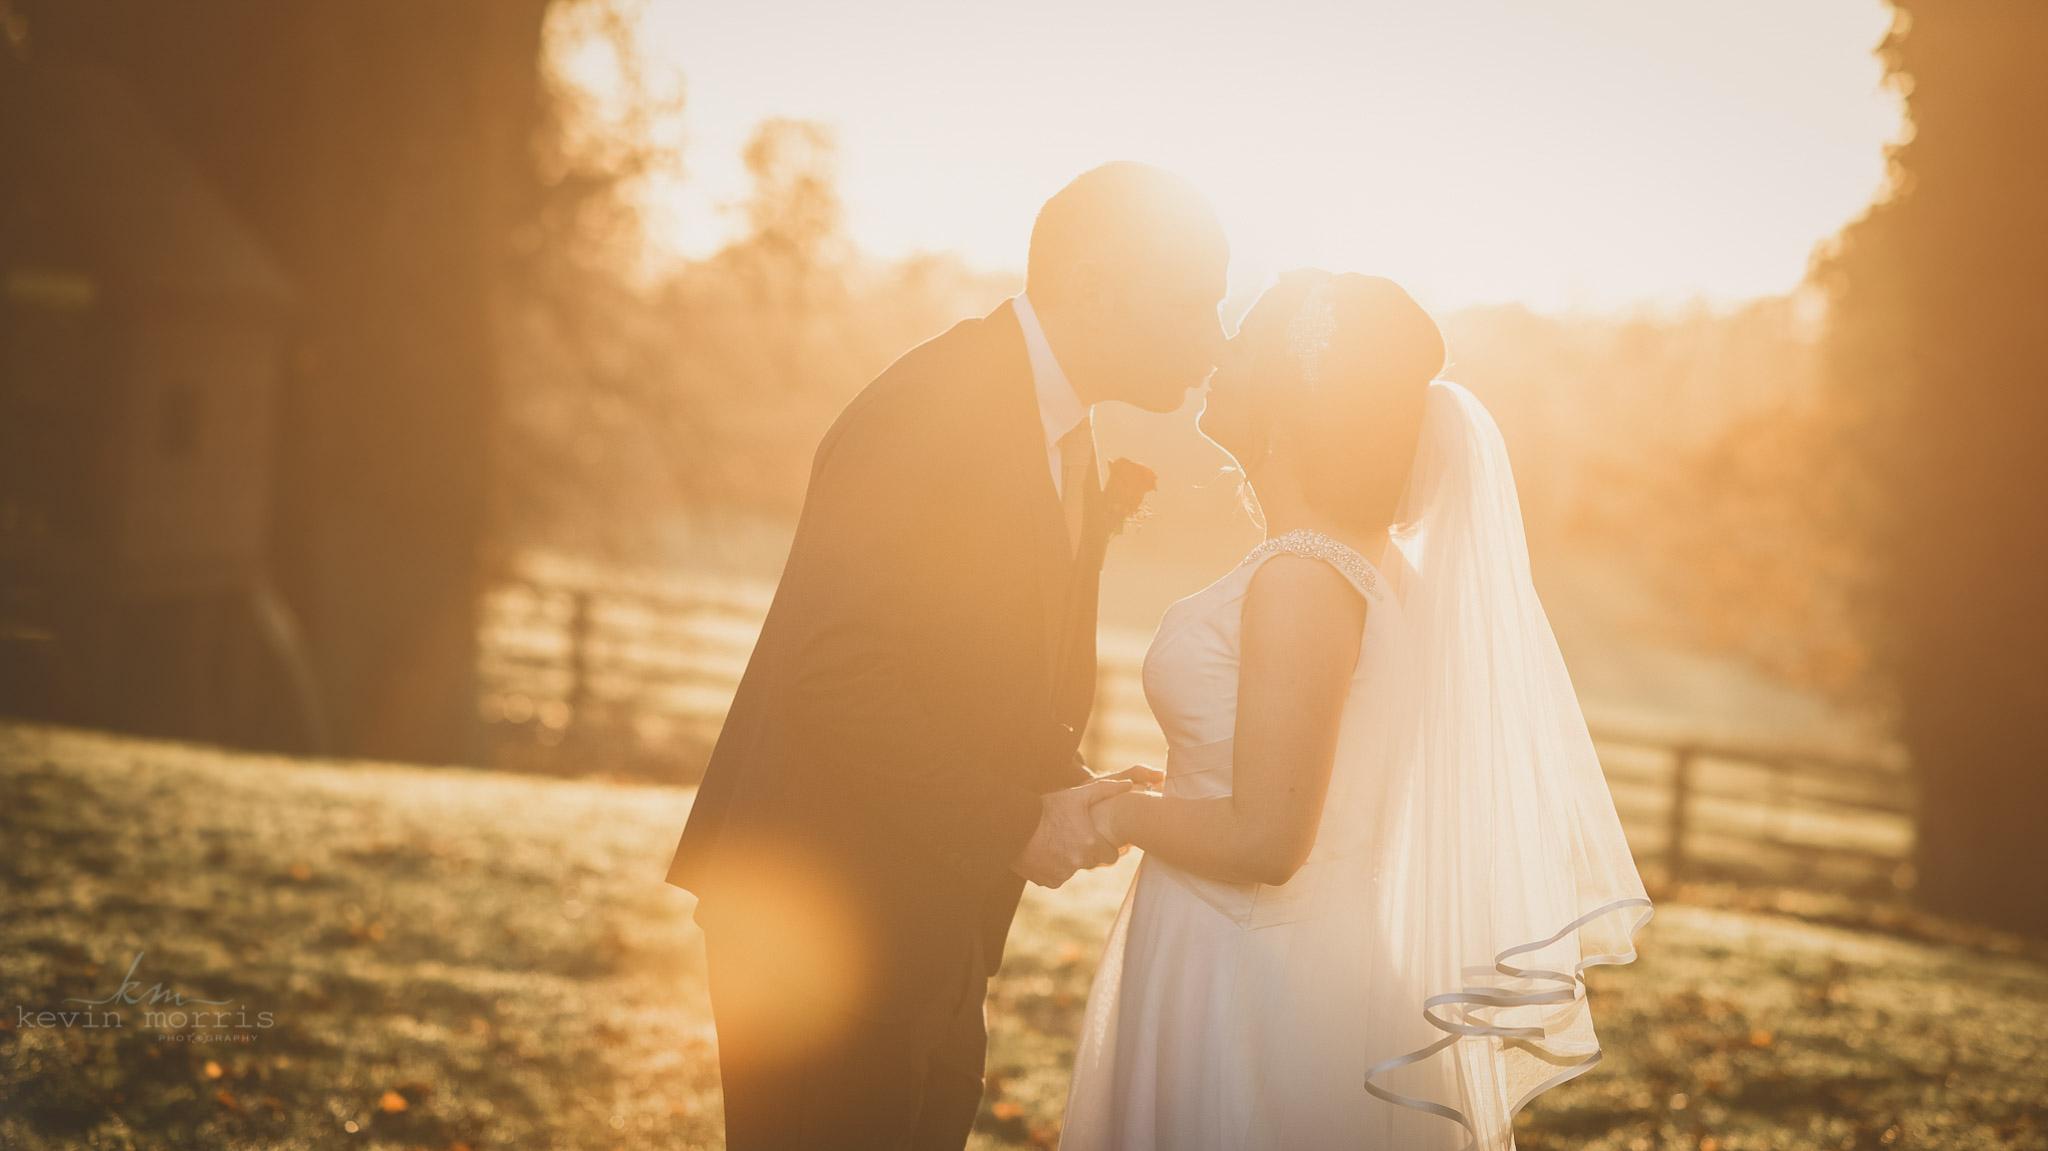 Eimear & williams wedding at the Lyrath Estate